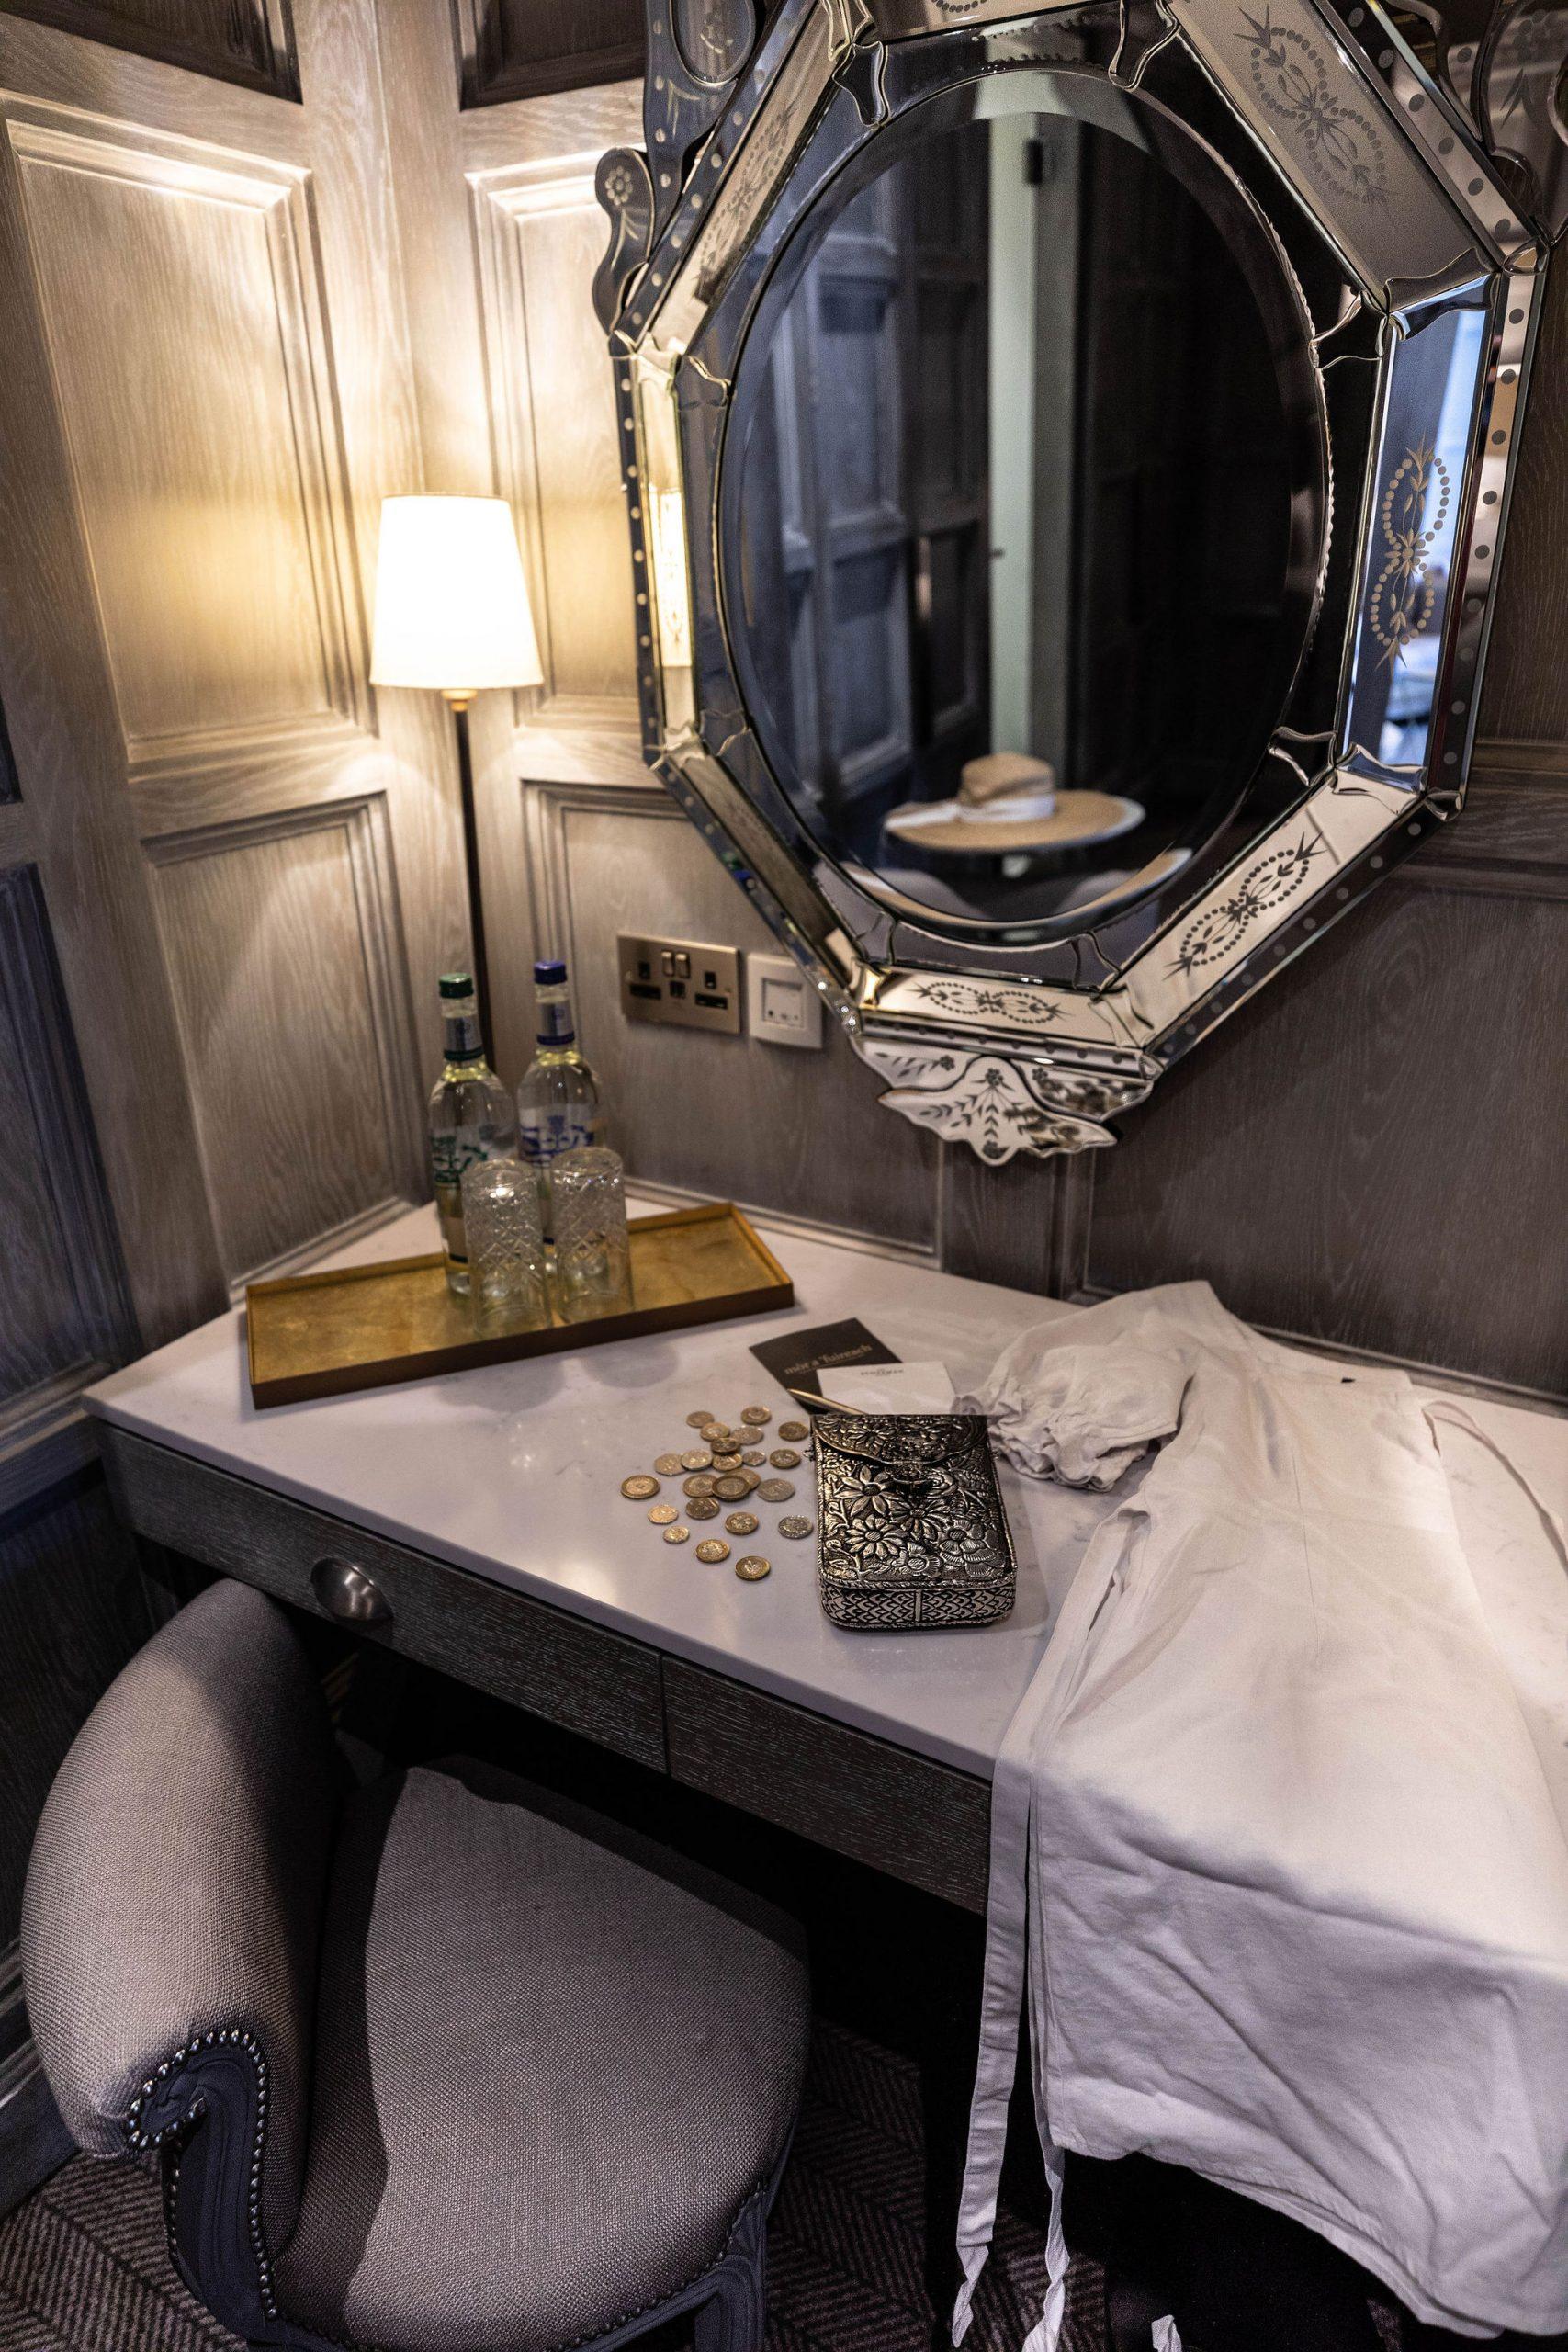 Bedroom Photos of the Headline Suite at The Scotsman Hotel in Edinburgh, Scotland